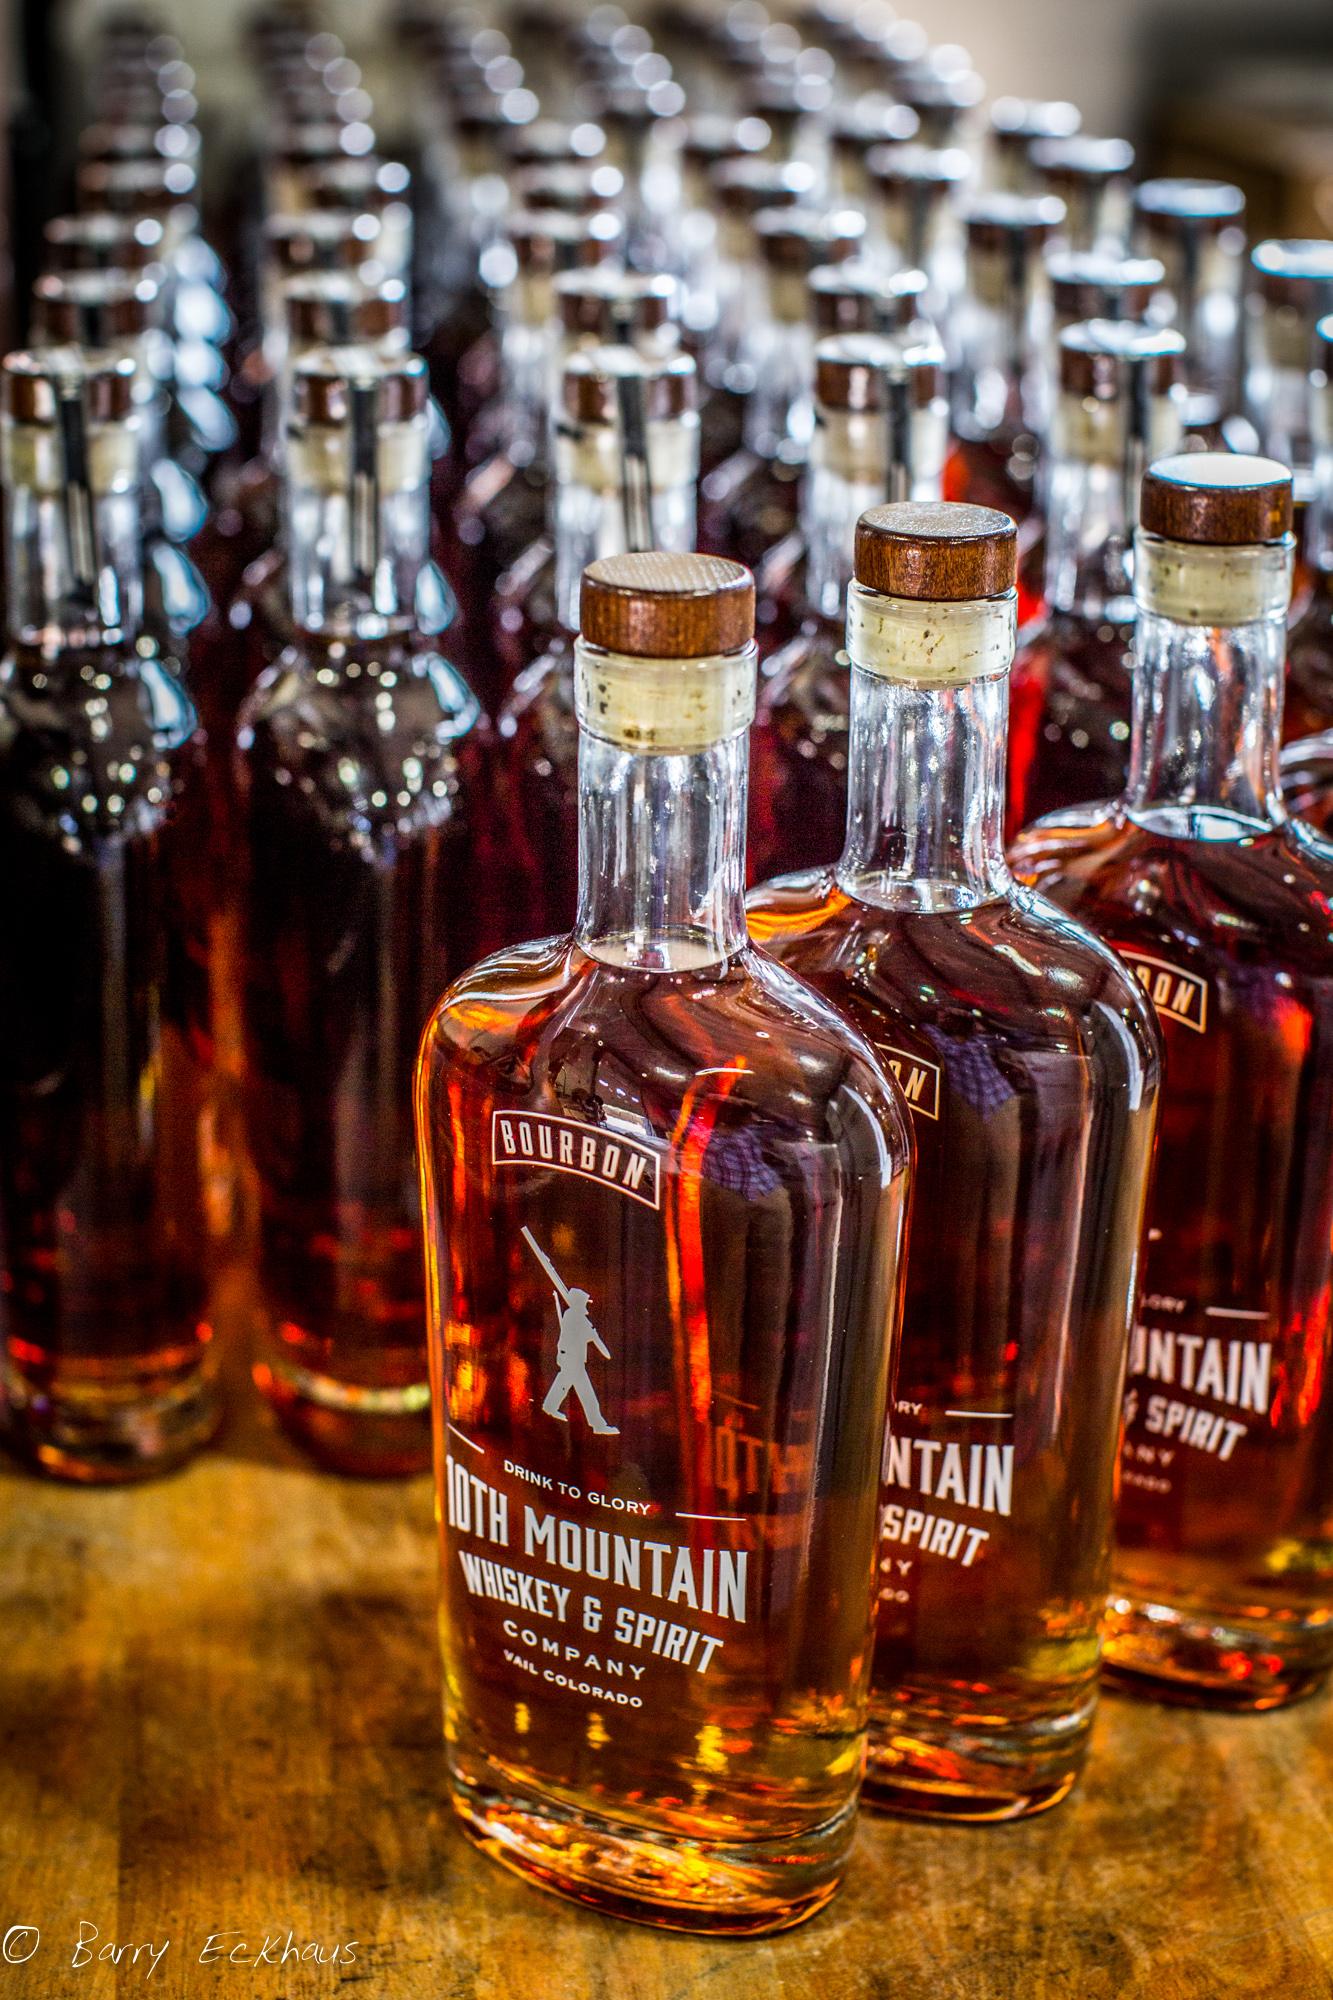 10th Mountain Distillery Bourbon